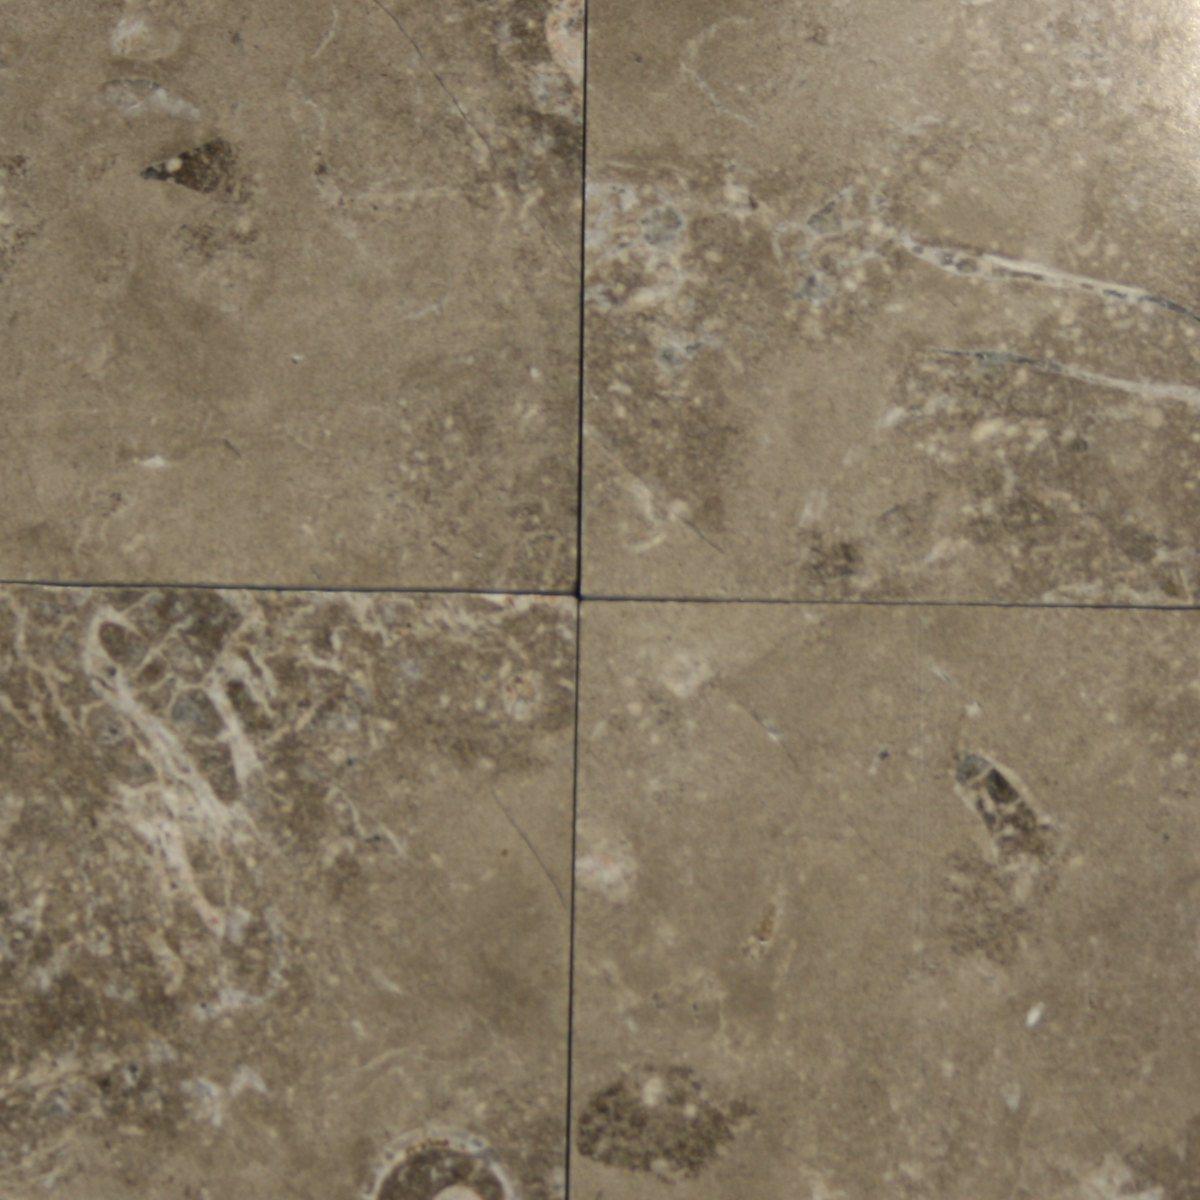 Masterly Stone Ing Tiles Stone Tiles Home Improvement Stone Ing India Stone Ing Advantages Disadvantages houzz 01 Natural Stone Flooring